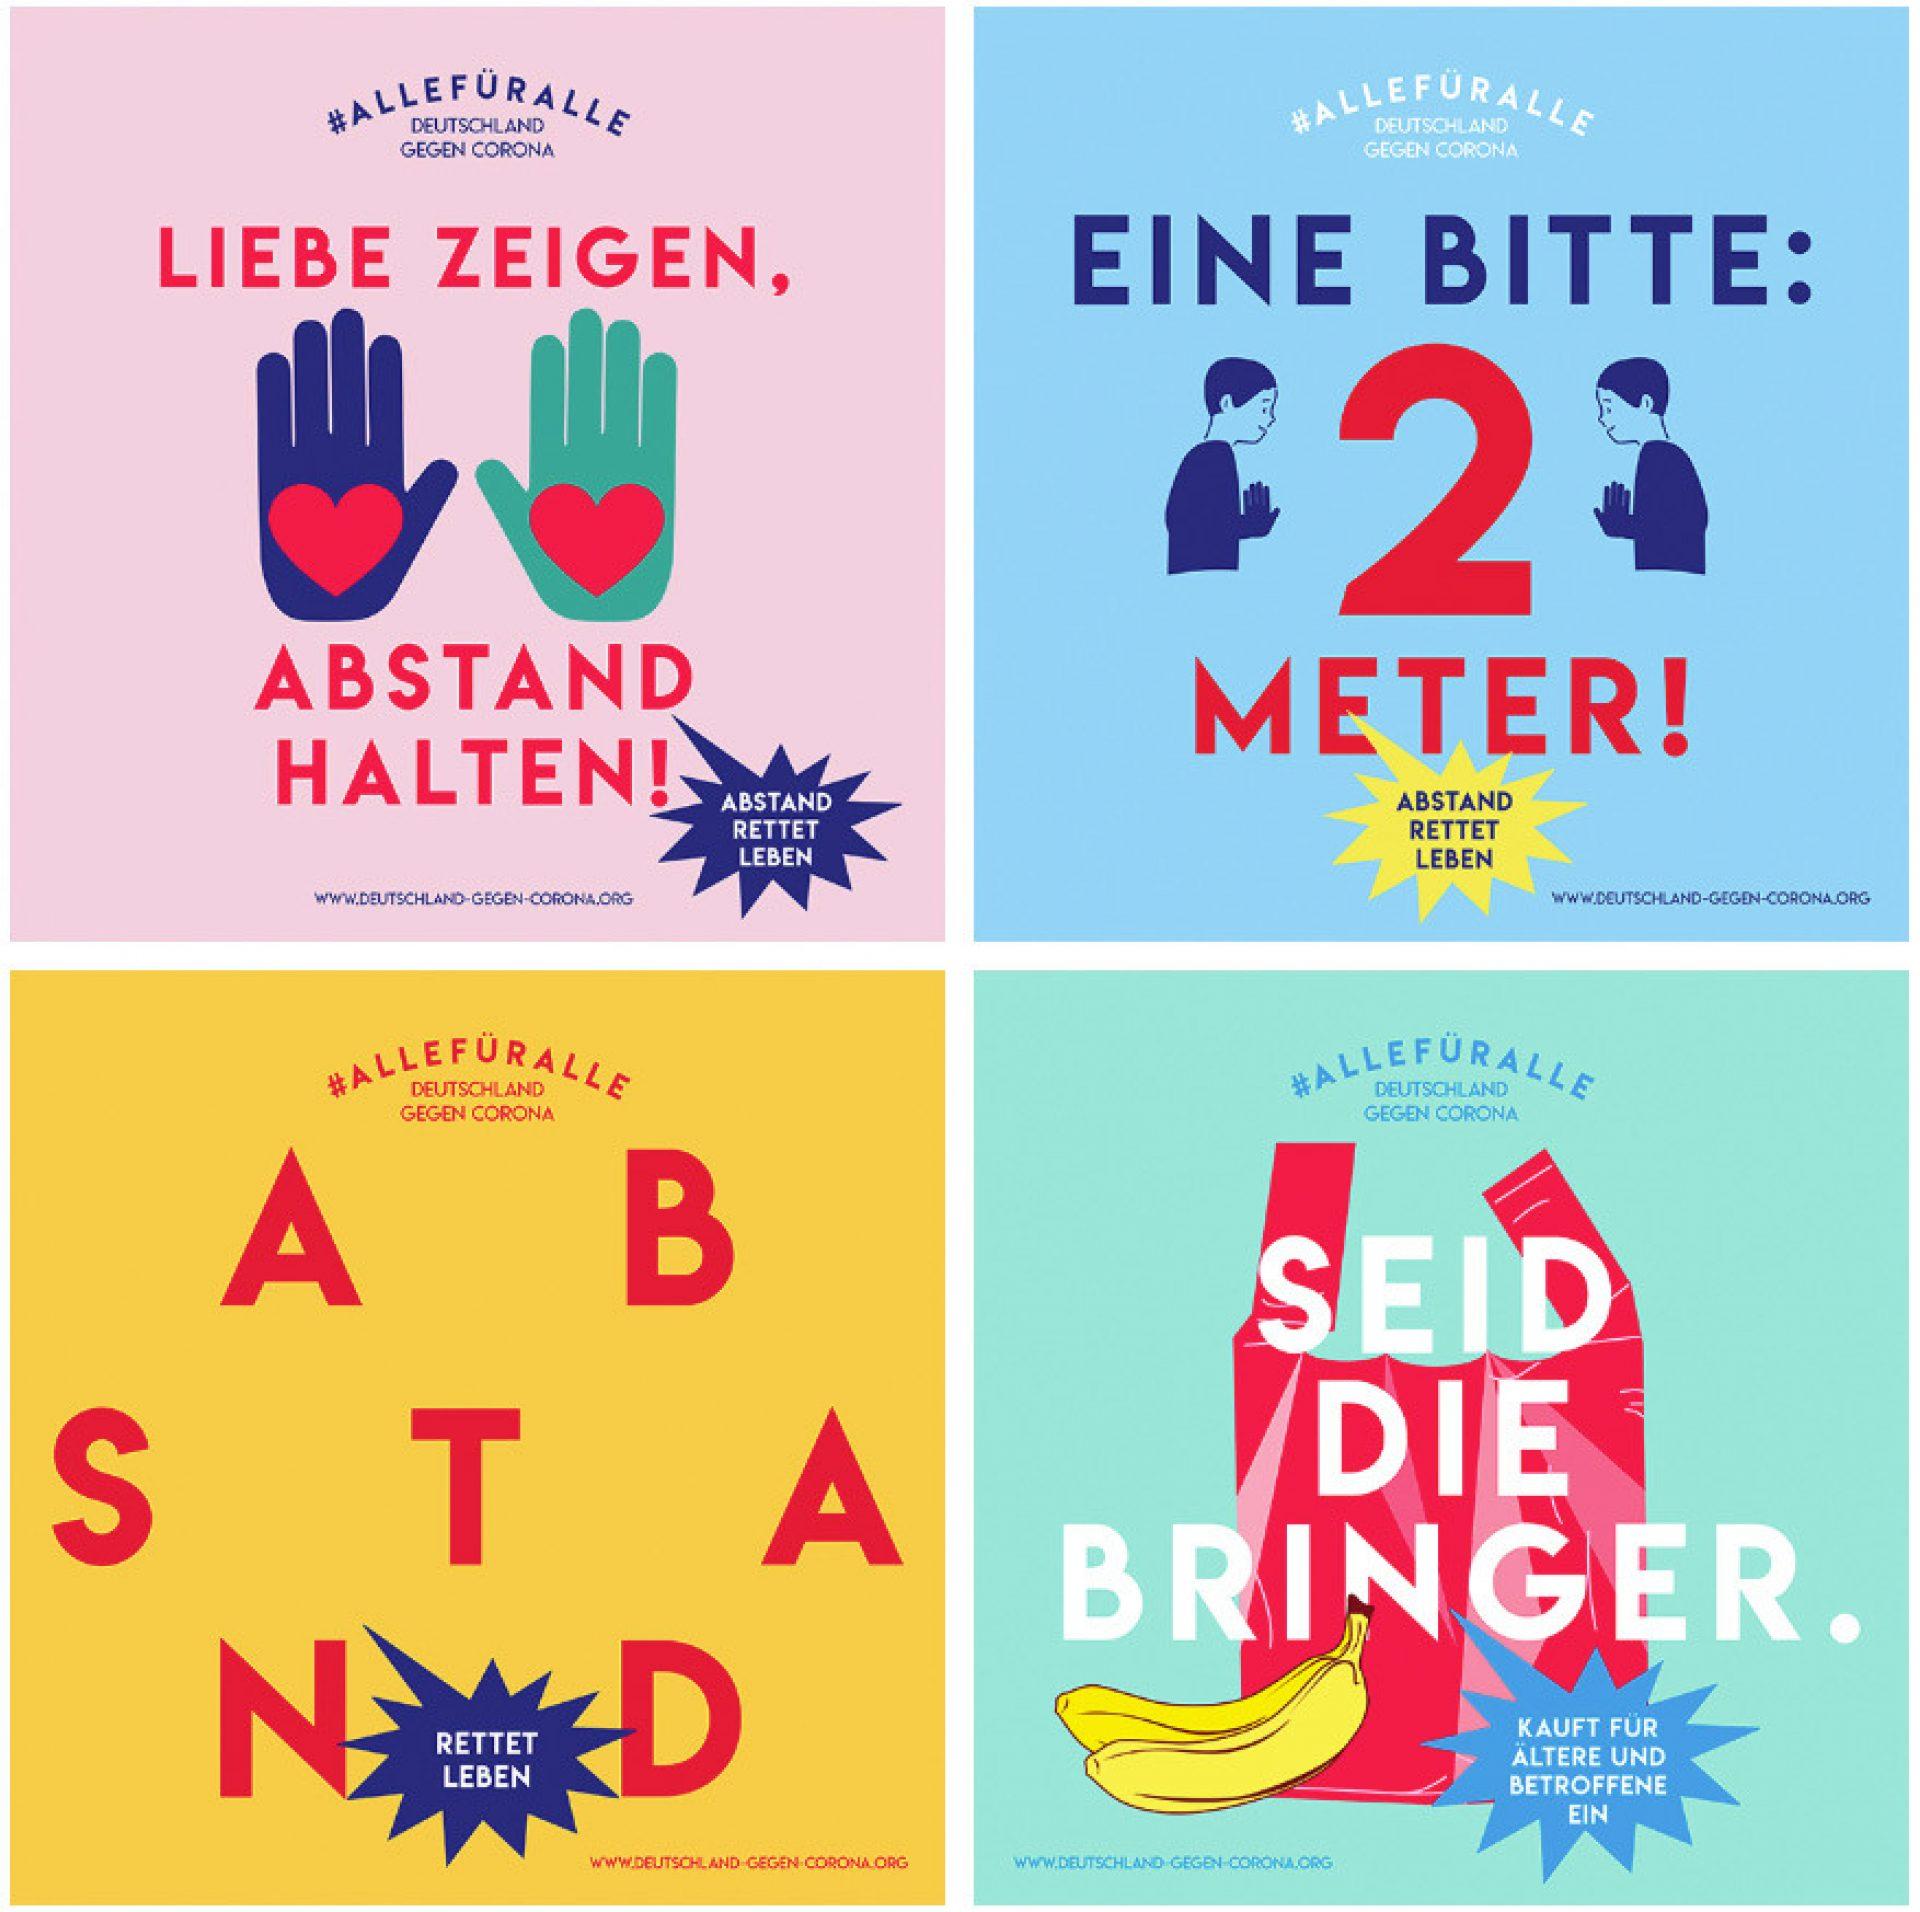 Fischer Appelt Initiative Deutschland Gegen Corona allefueralle Motive Abstand